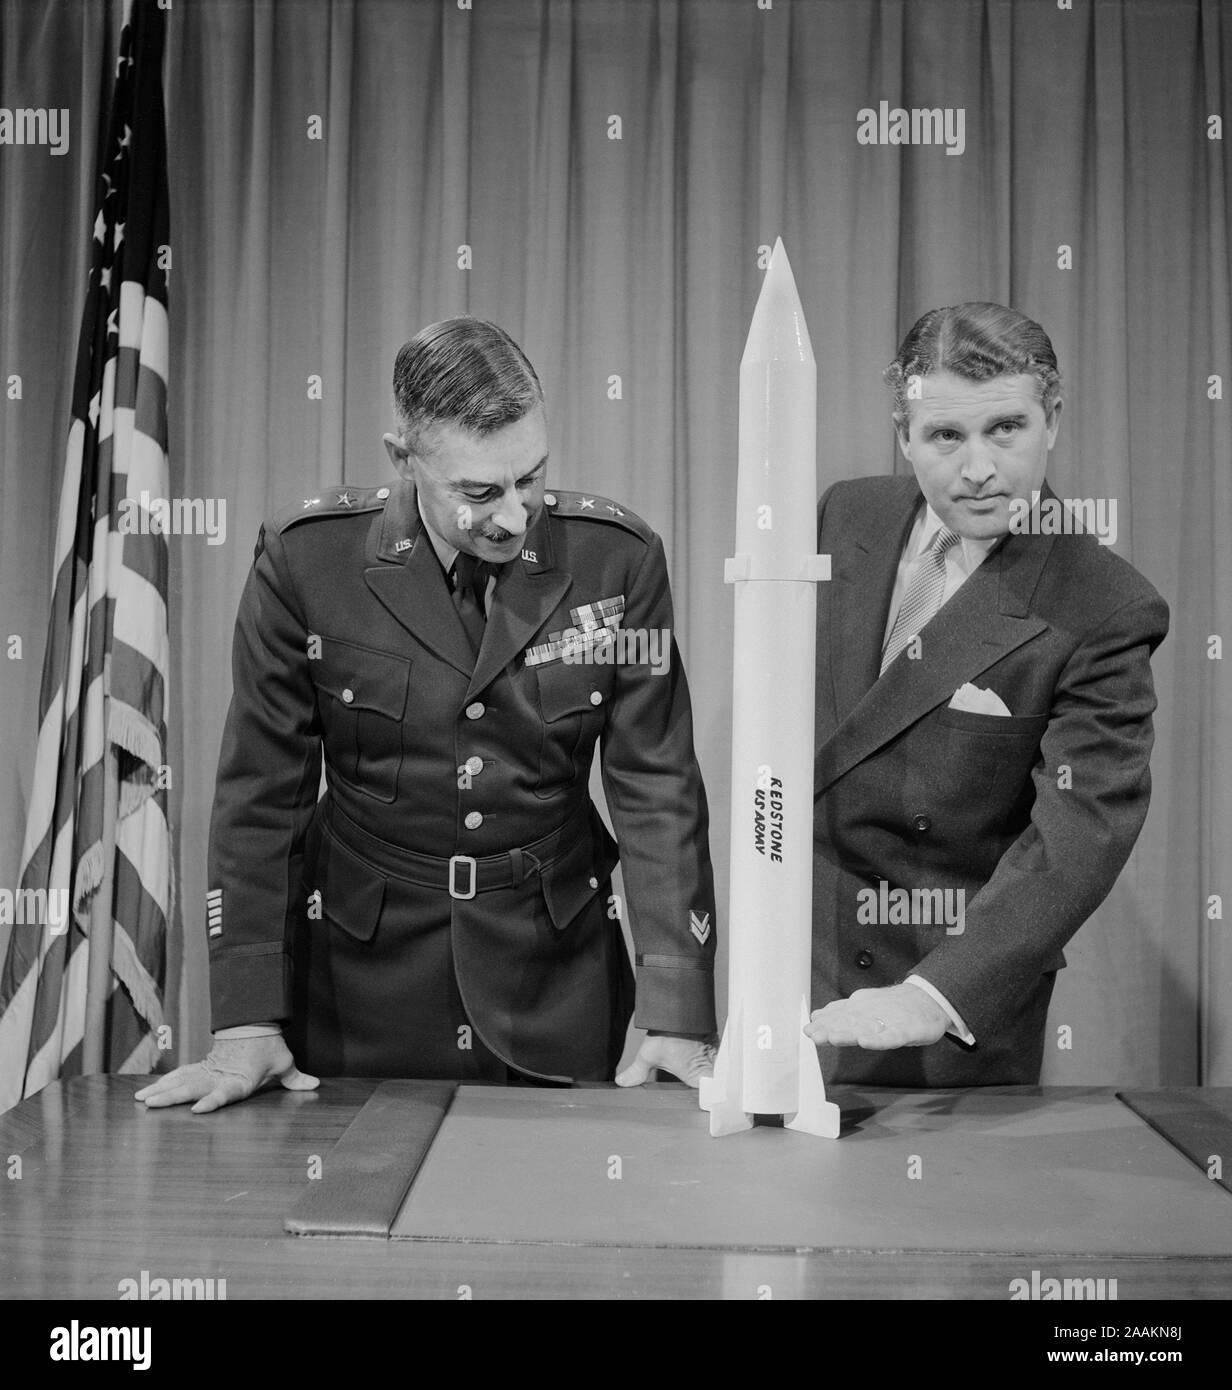 Generalmajor J.B. Medaris & Dr. Wernher von Braun mit Replik von Redstone Lenkflugkörper, Foto von Thomas J. O'Halloran, 20. Januar 1956 Stockfoto